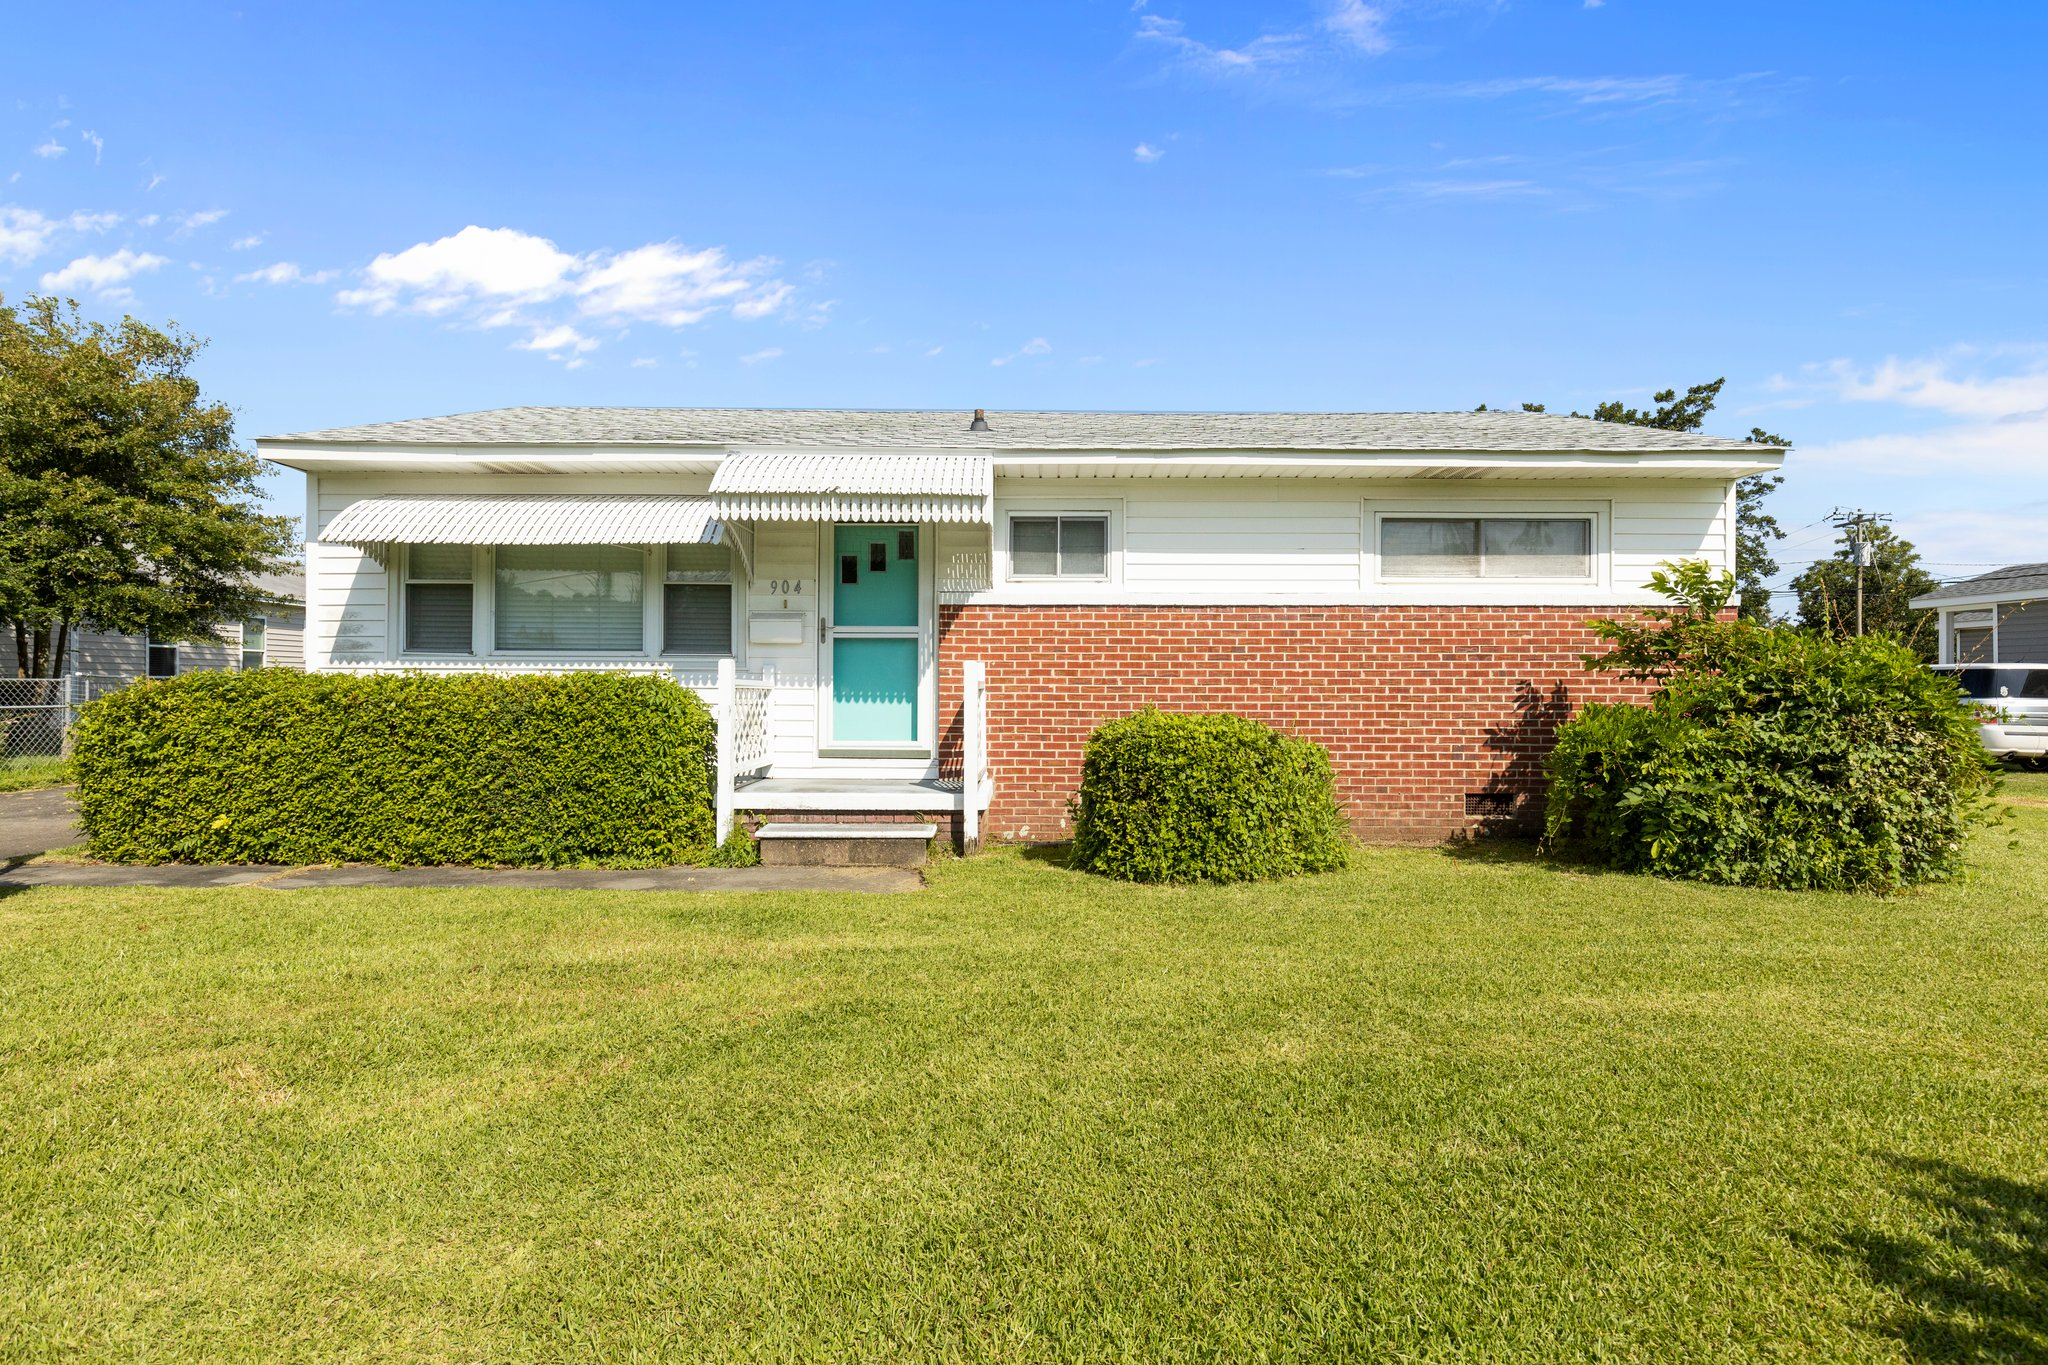 904 N Yaupon Terrace, Morehead City, NC 28557, USA